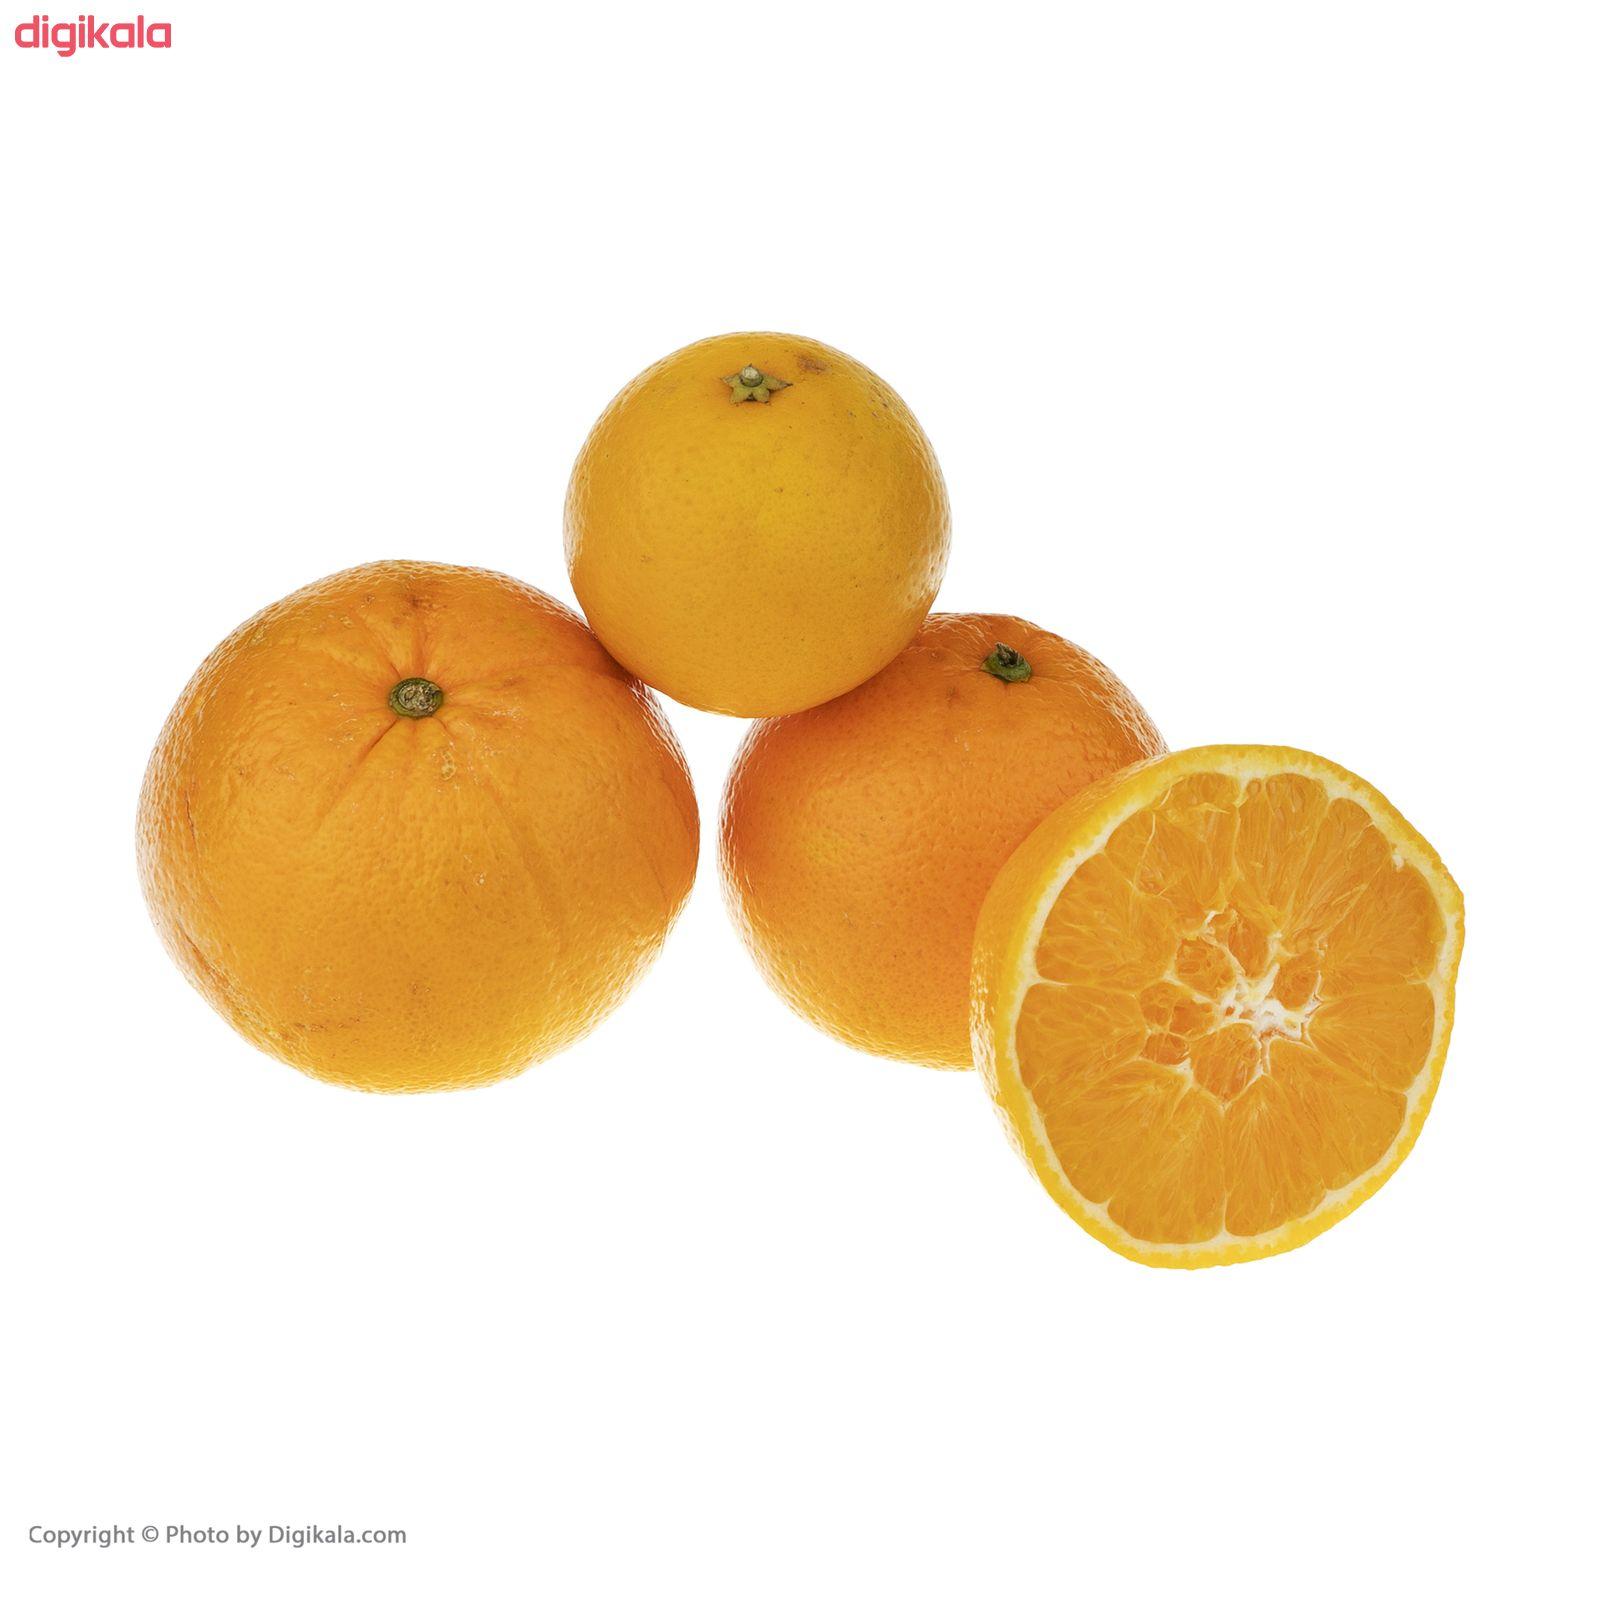 پرتقال تامسون شمال فله - 1 کیلوگرم main 1 3